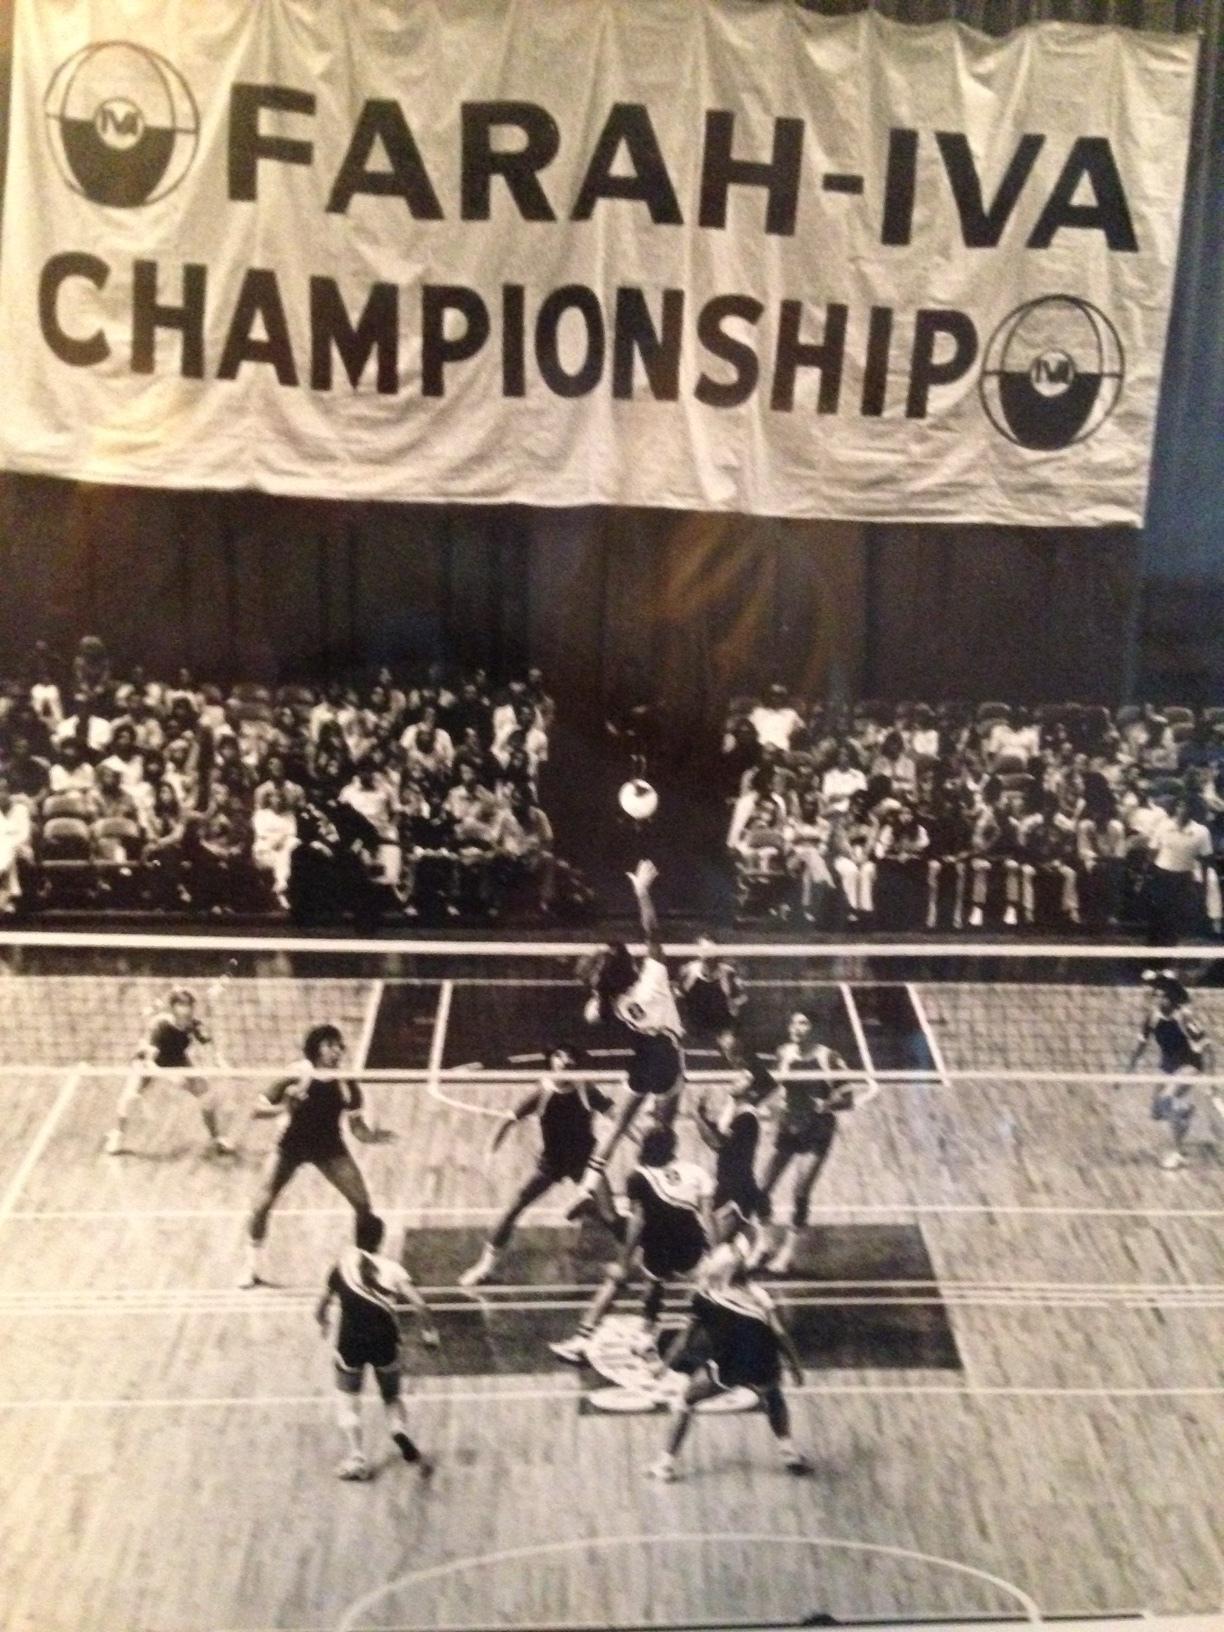 IVA 1975 Championship Match - Los Angeles Stars versus San Diego Breakers